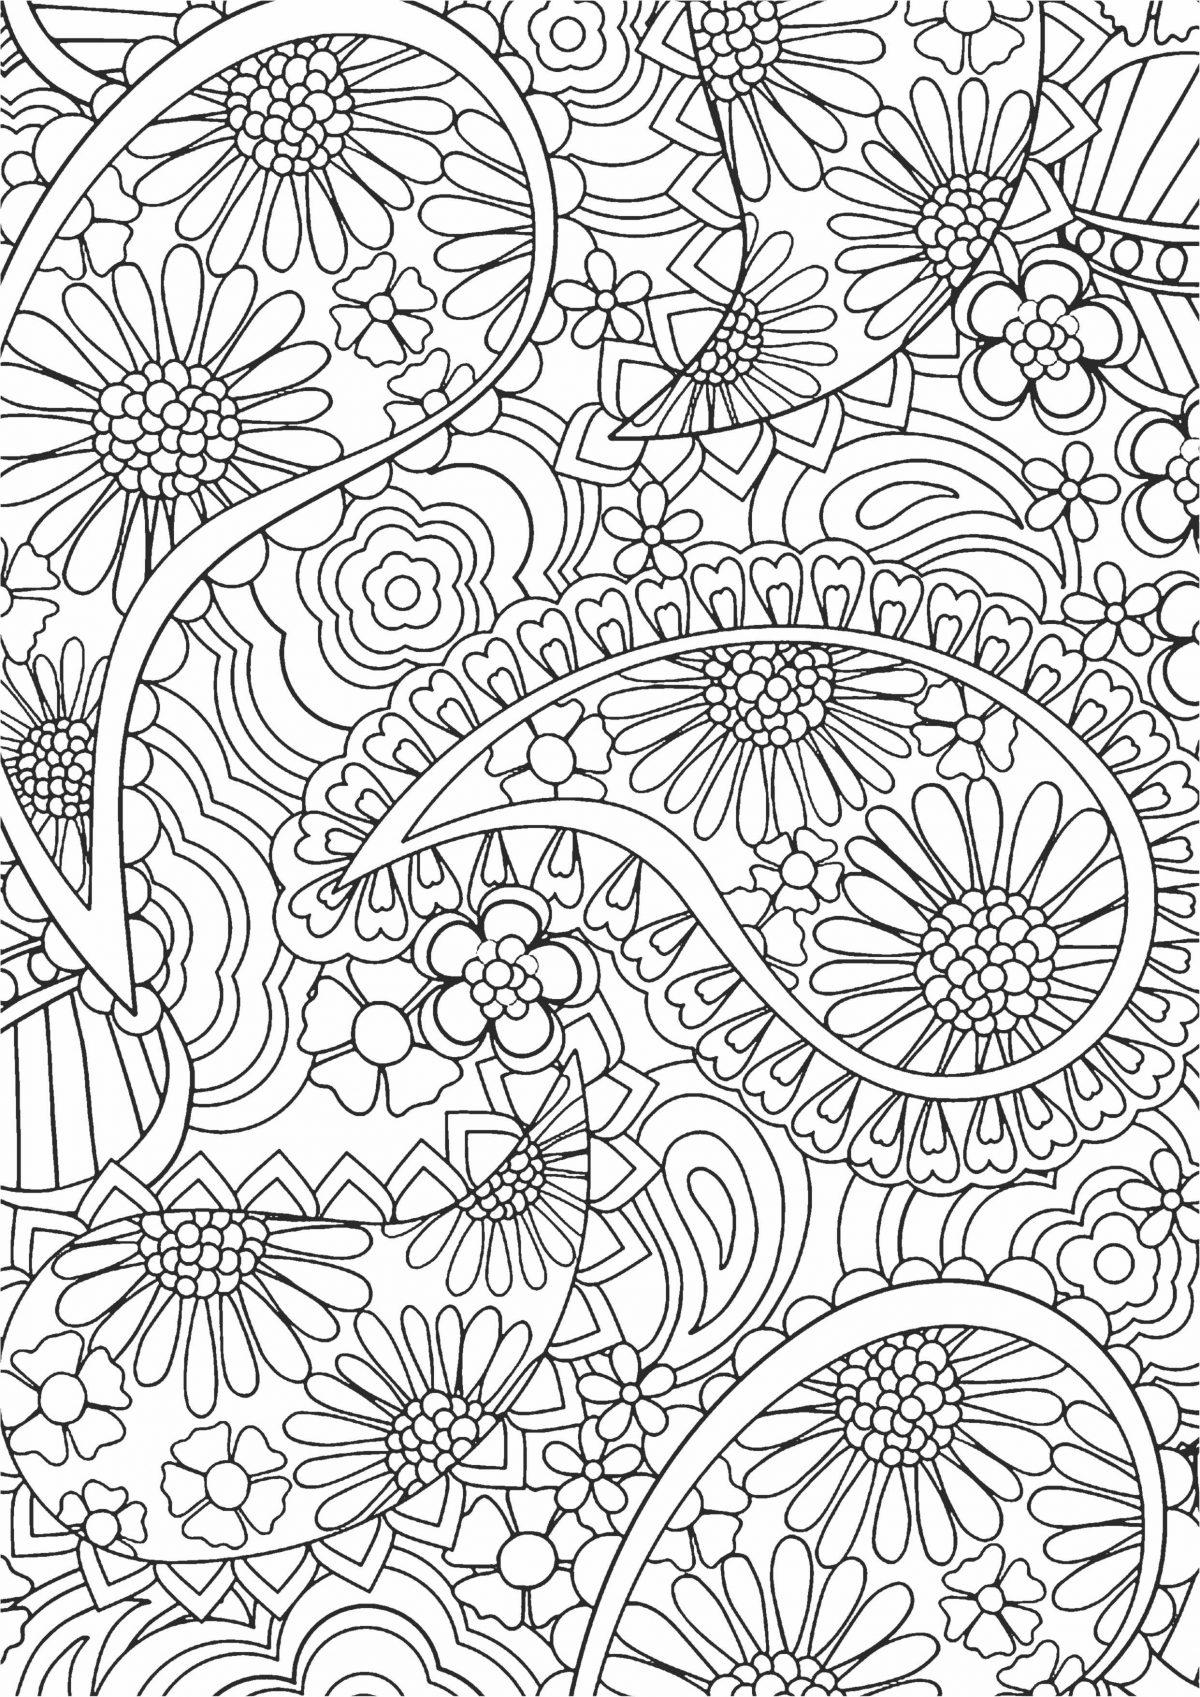 Раскраска с узорами и цветами